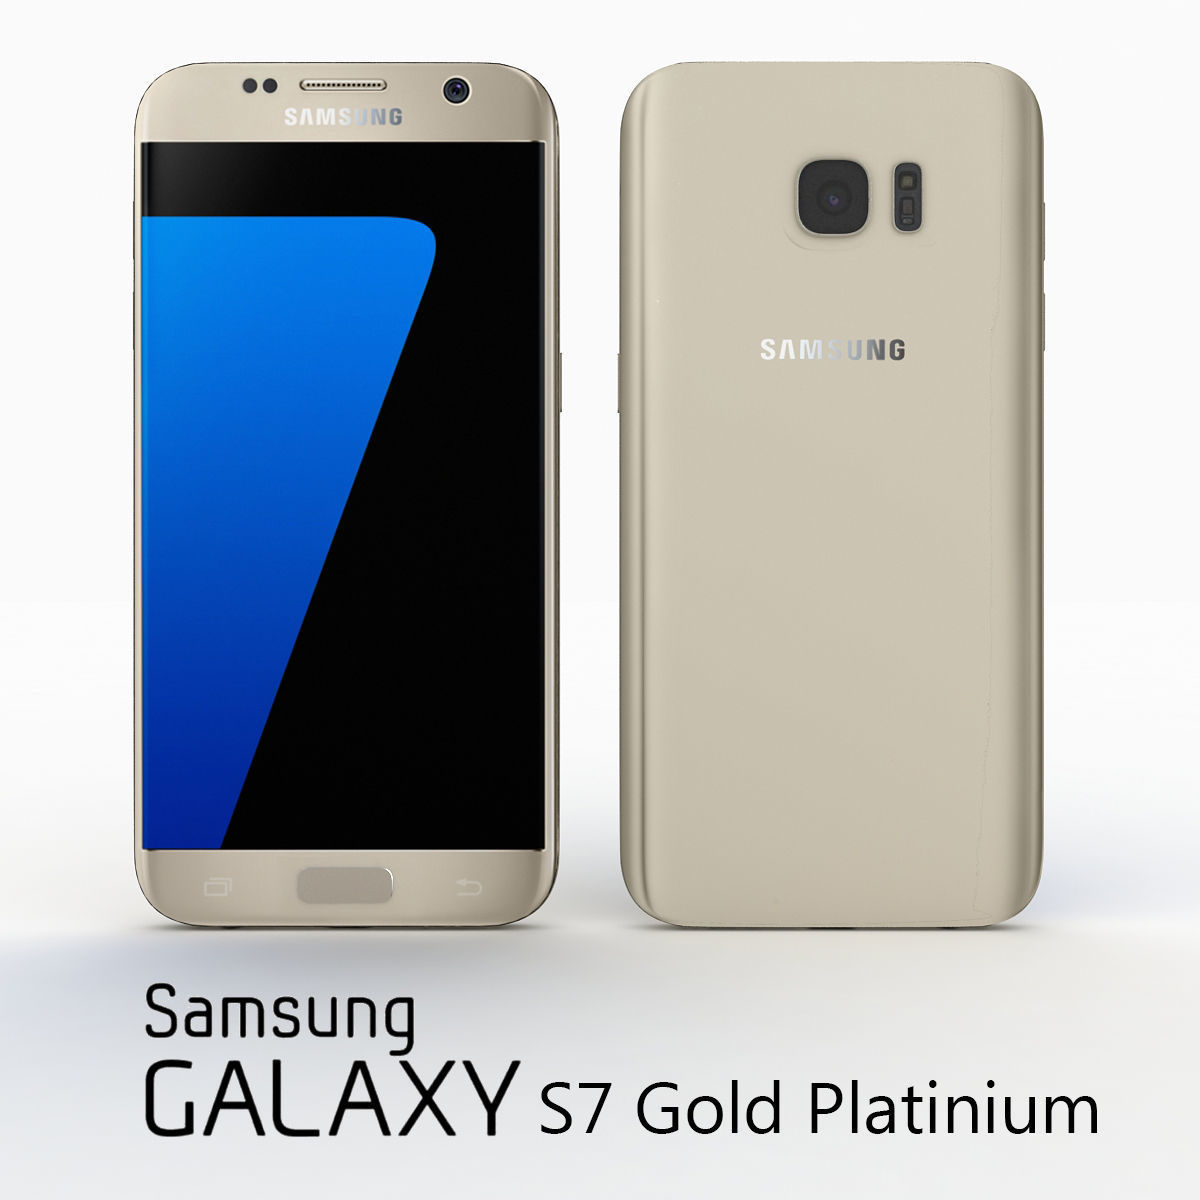 Samsung Galaxy S7 Gold Platinium